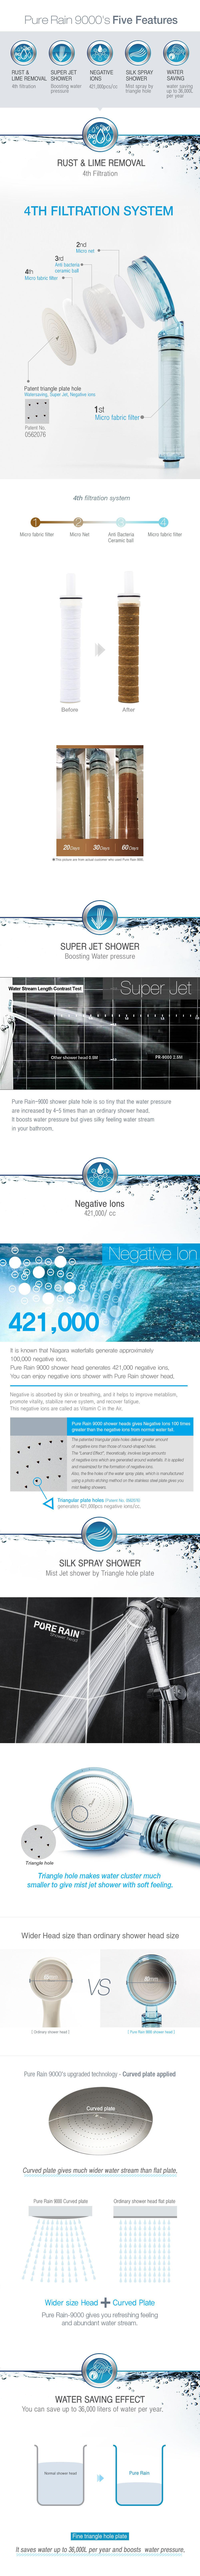 Pure Rain 9000 Features